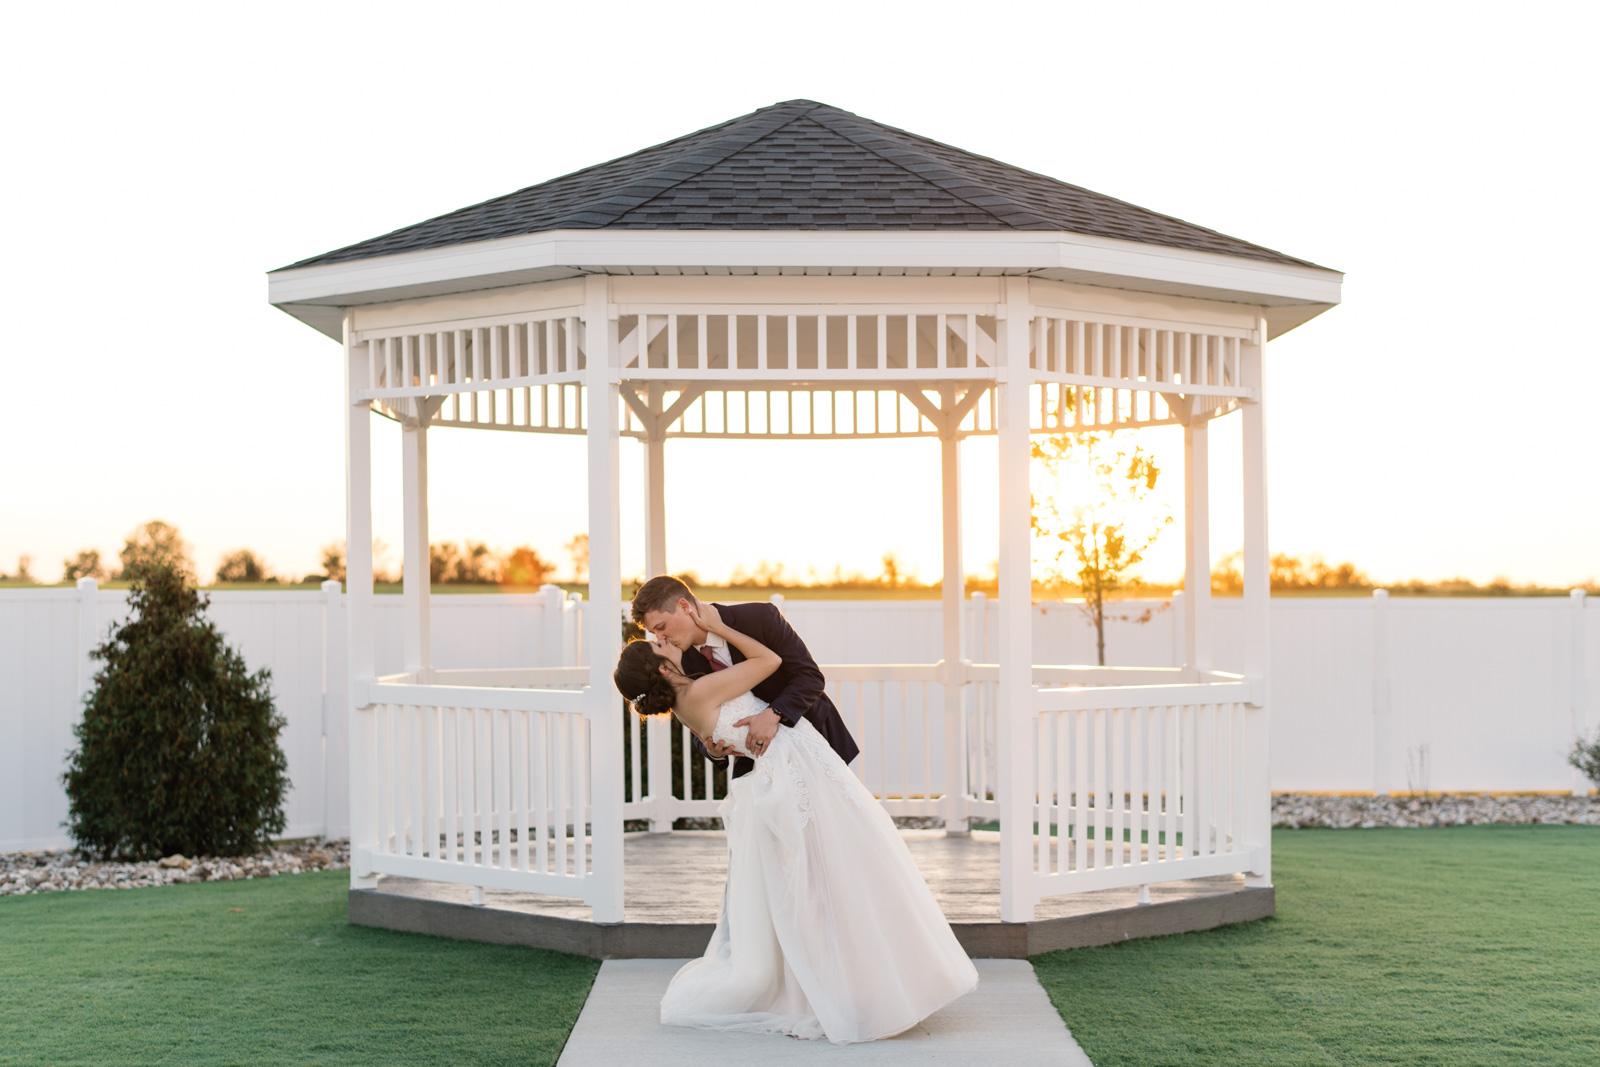 groom dips bride in gazebo at sunset epic event center cedar rapids wedding venue